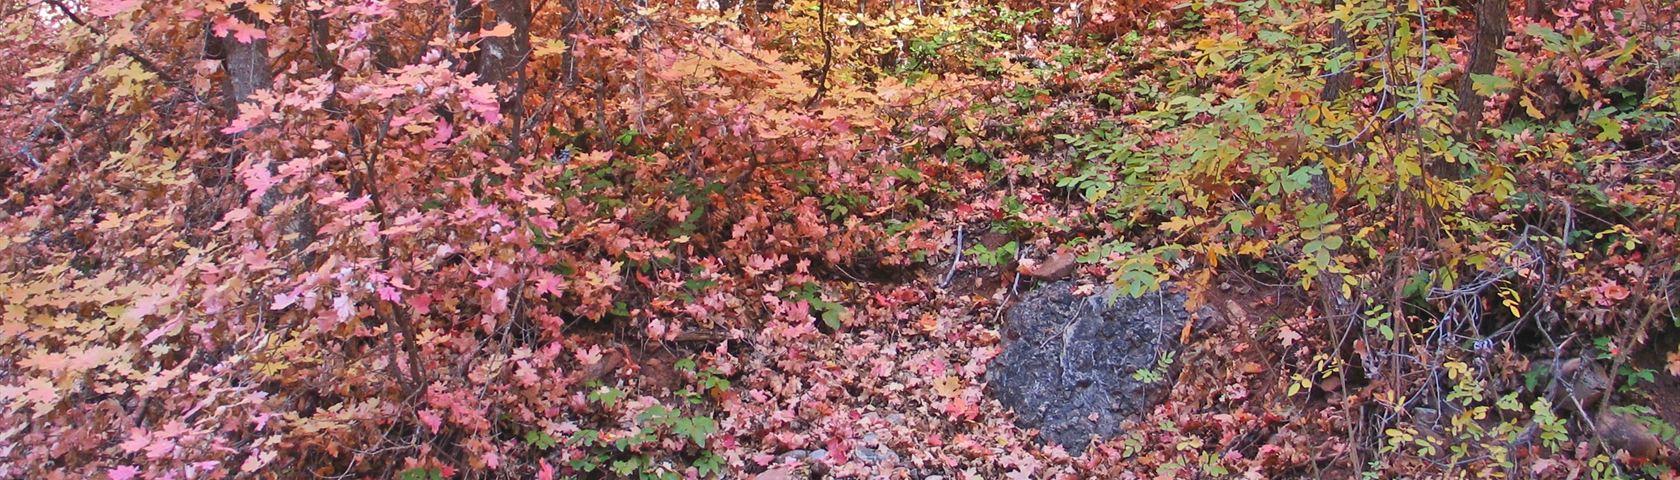 Jungle of Leaves